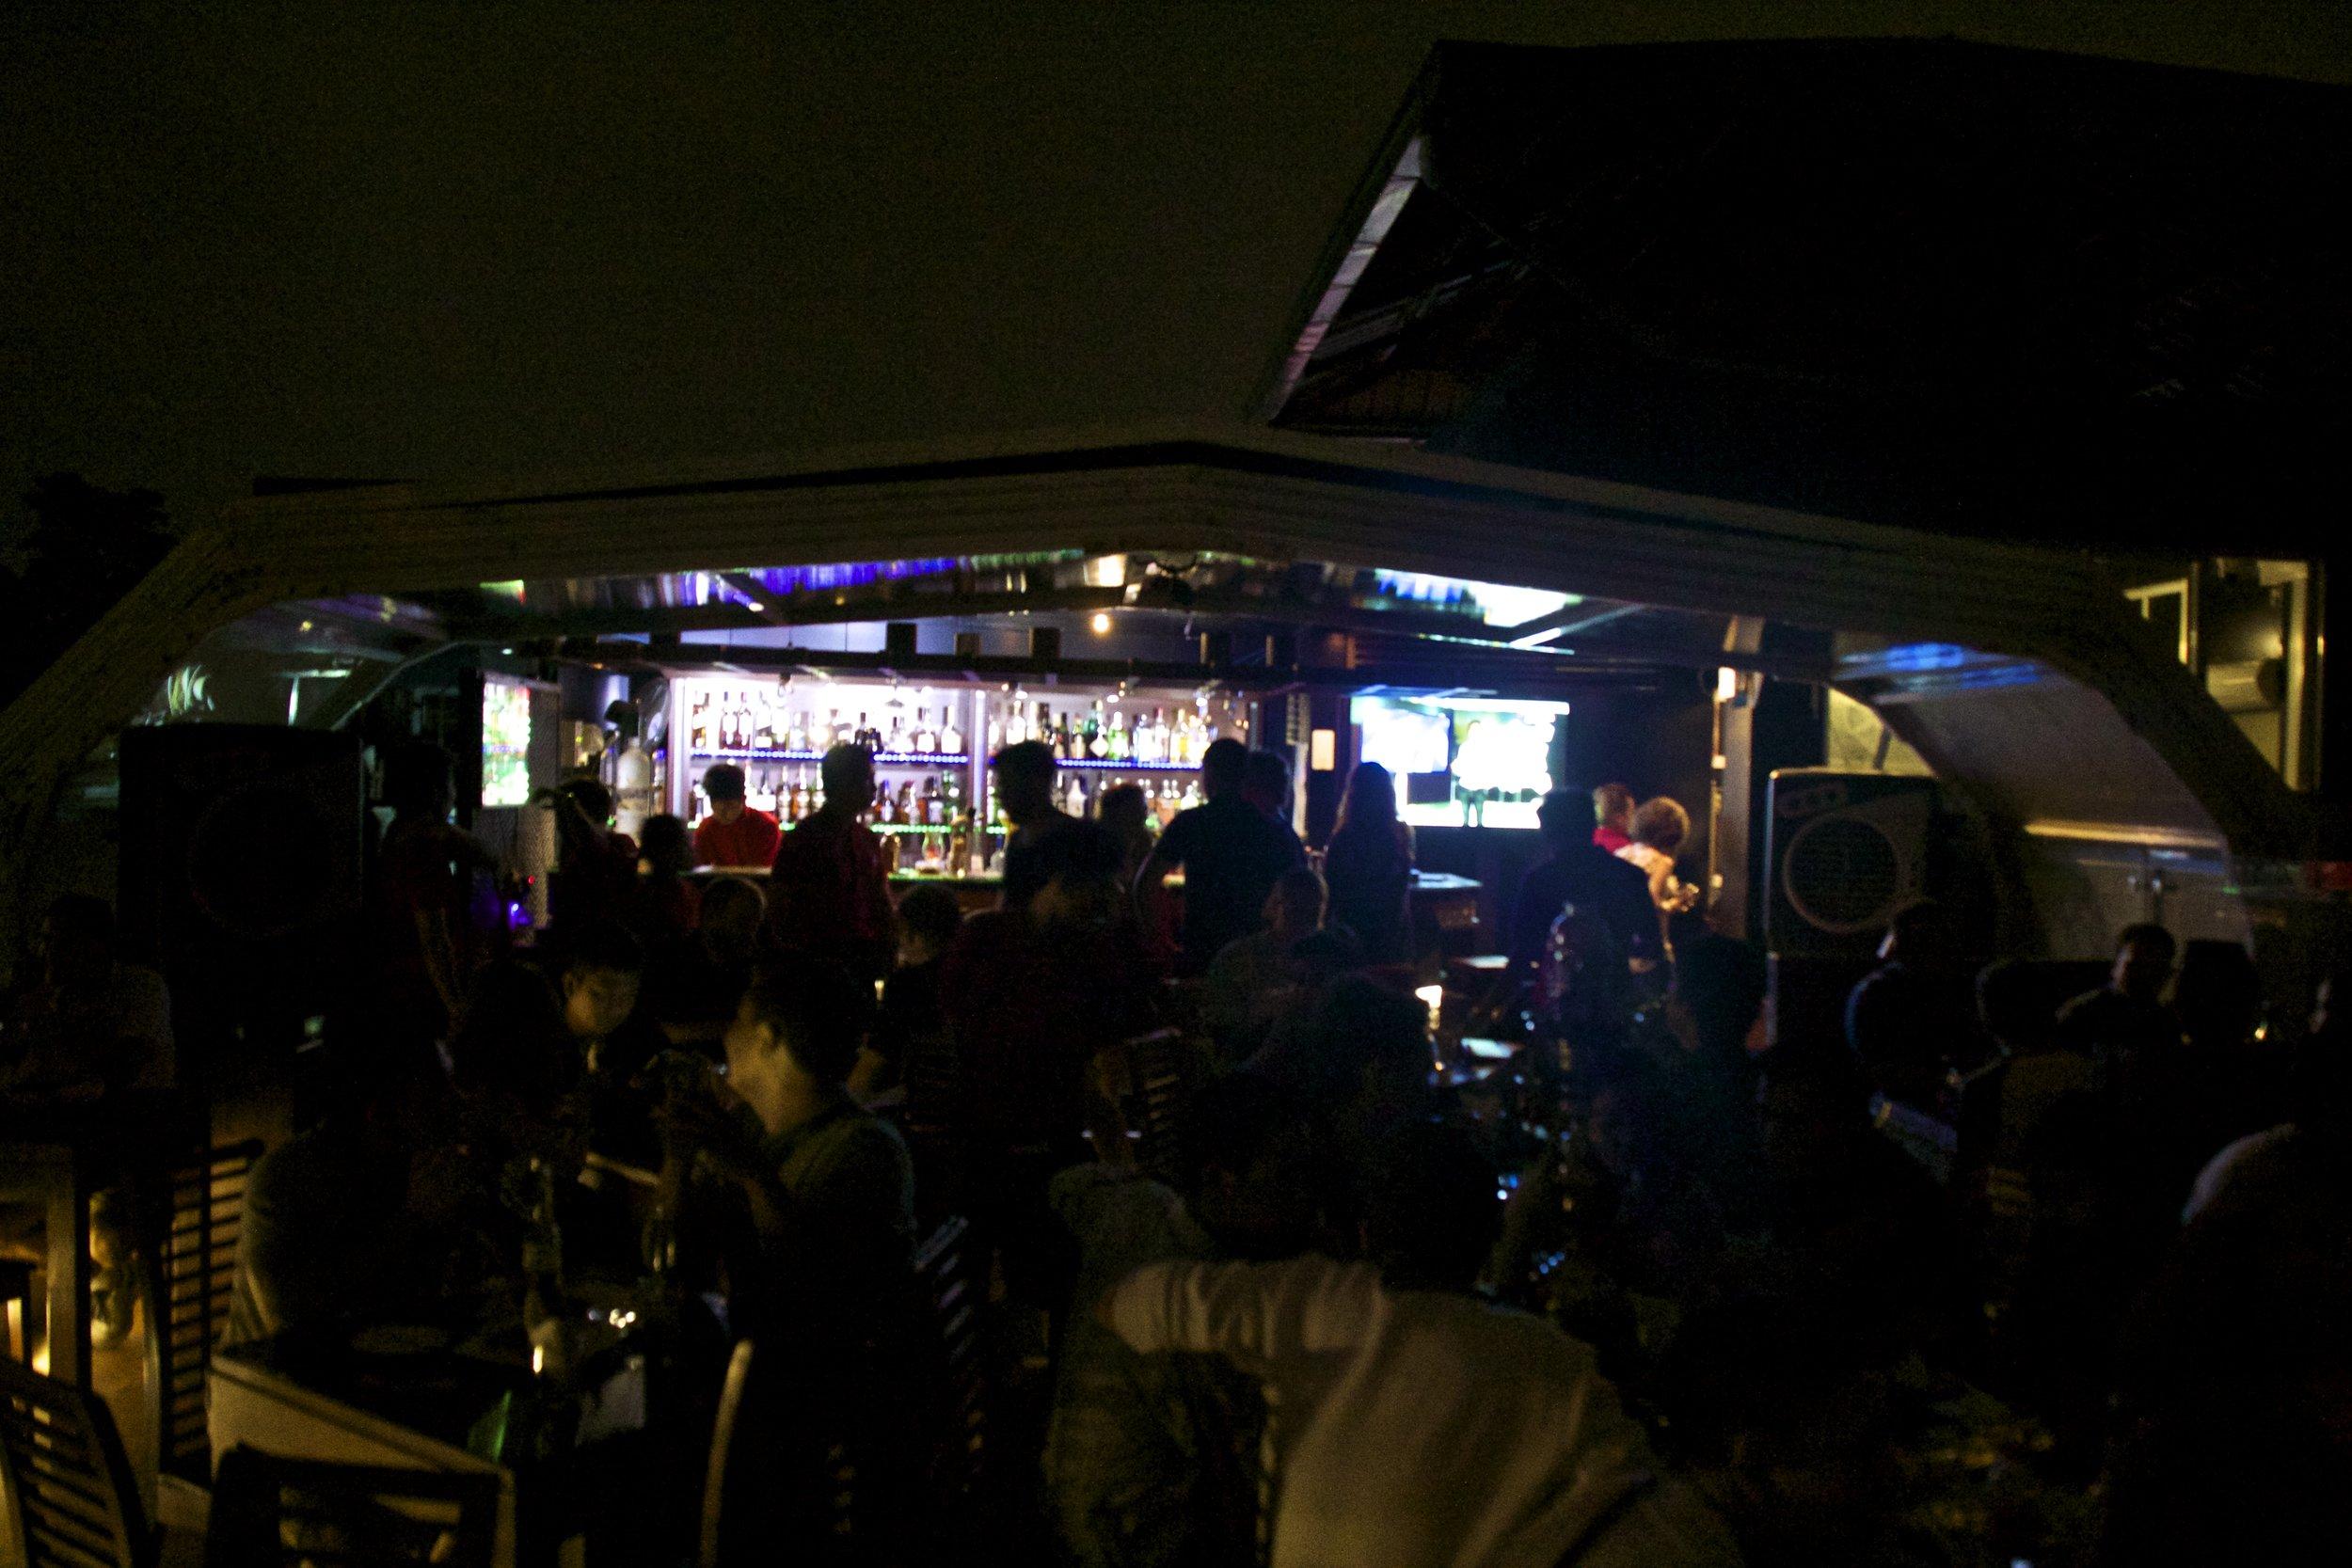 vista bar nightlife rangoon yangon burma myanmar 3.jpg